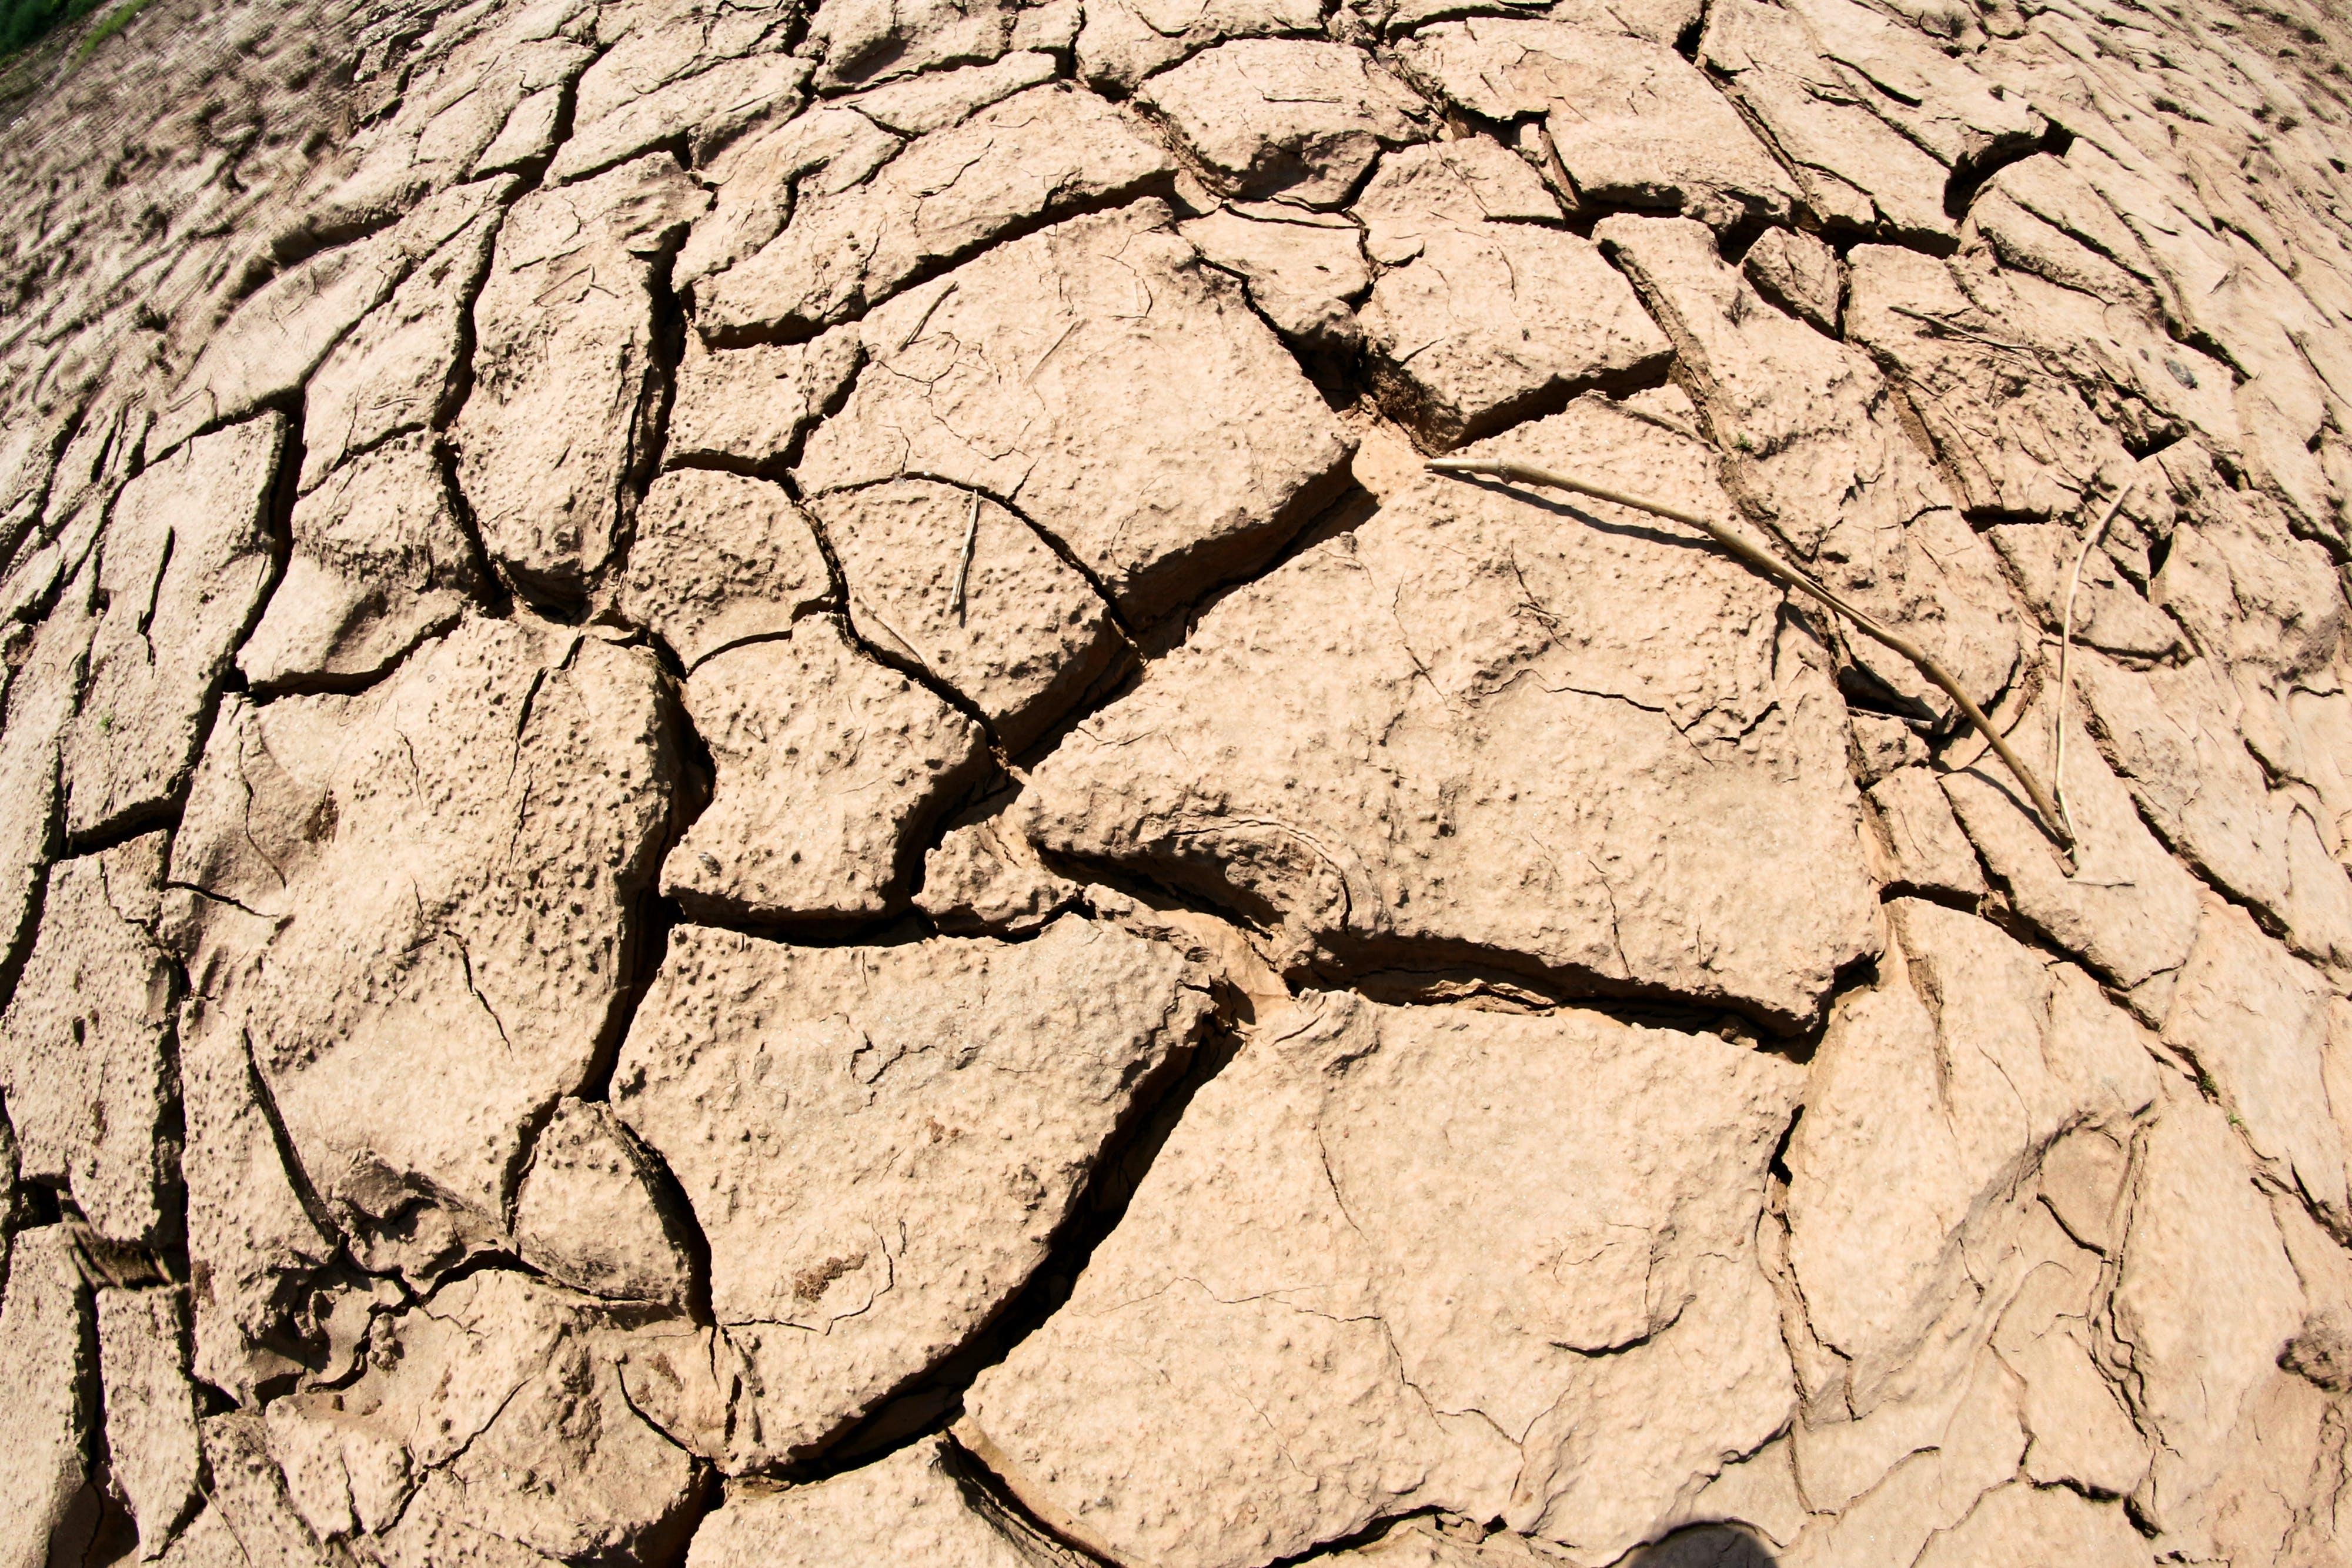 arid, clay, close-up